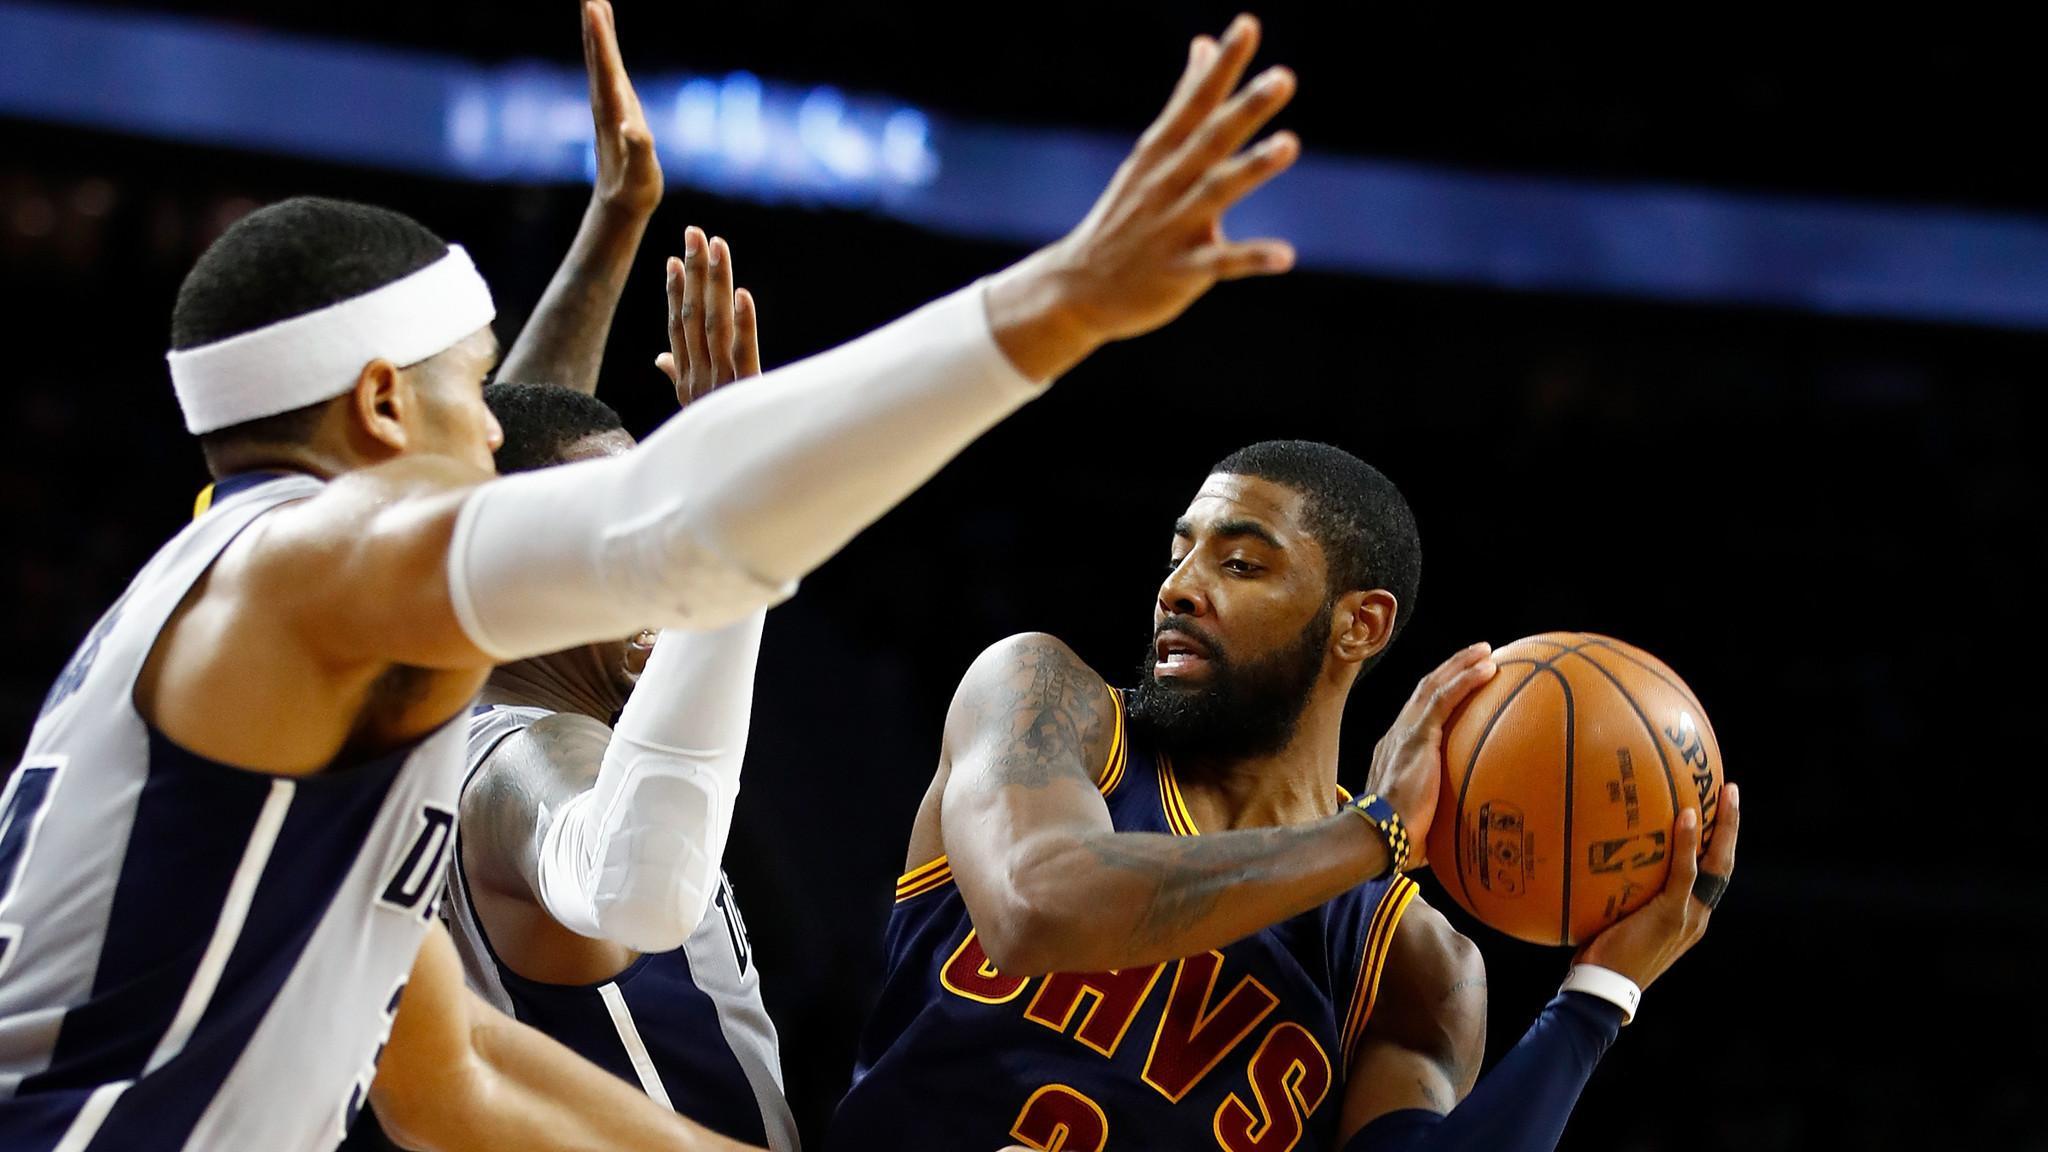 charlotteobserver.com NBA roundup: Piston snap five-game losing streak by  beating the Cavaliers